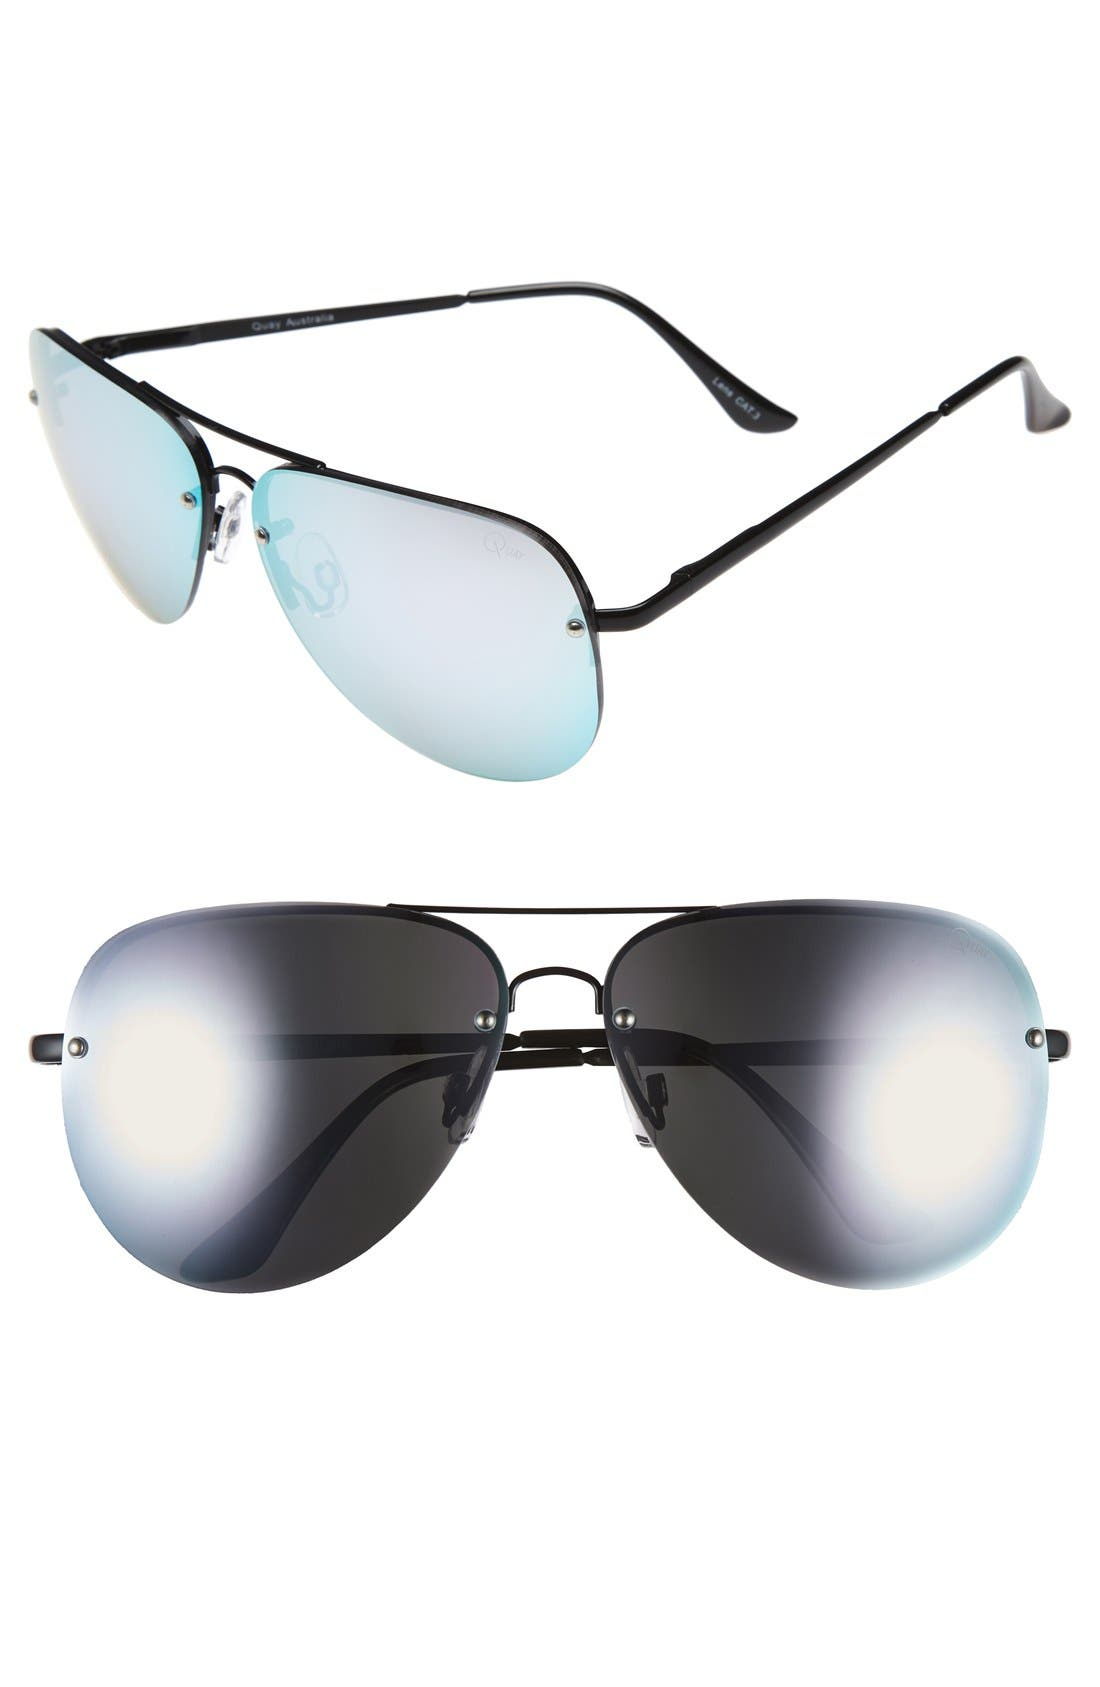 Quay Australia 'Muse' 65mm Mirrored Aviator Sunglasses